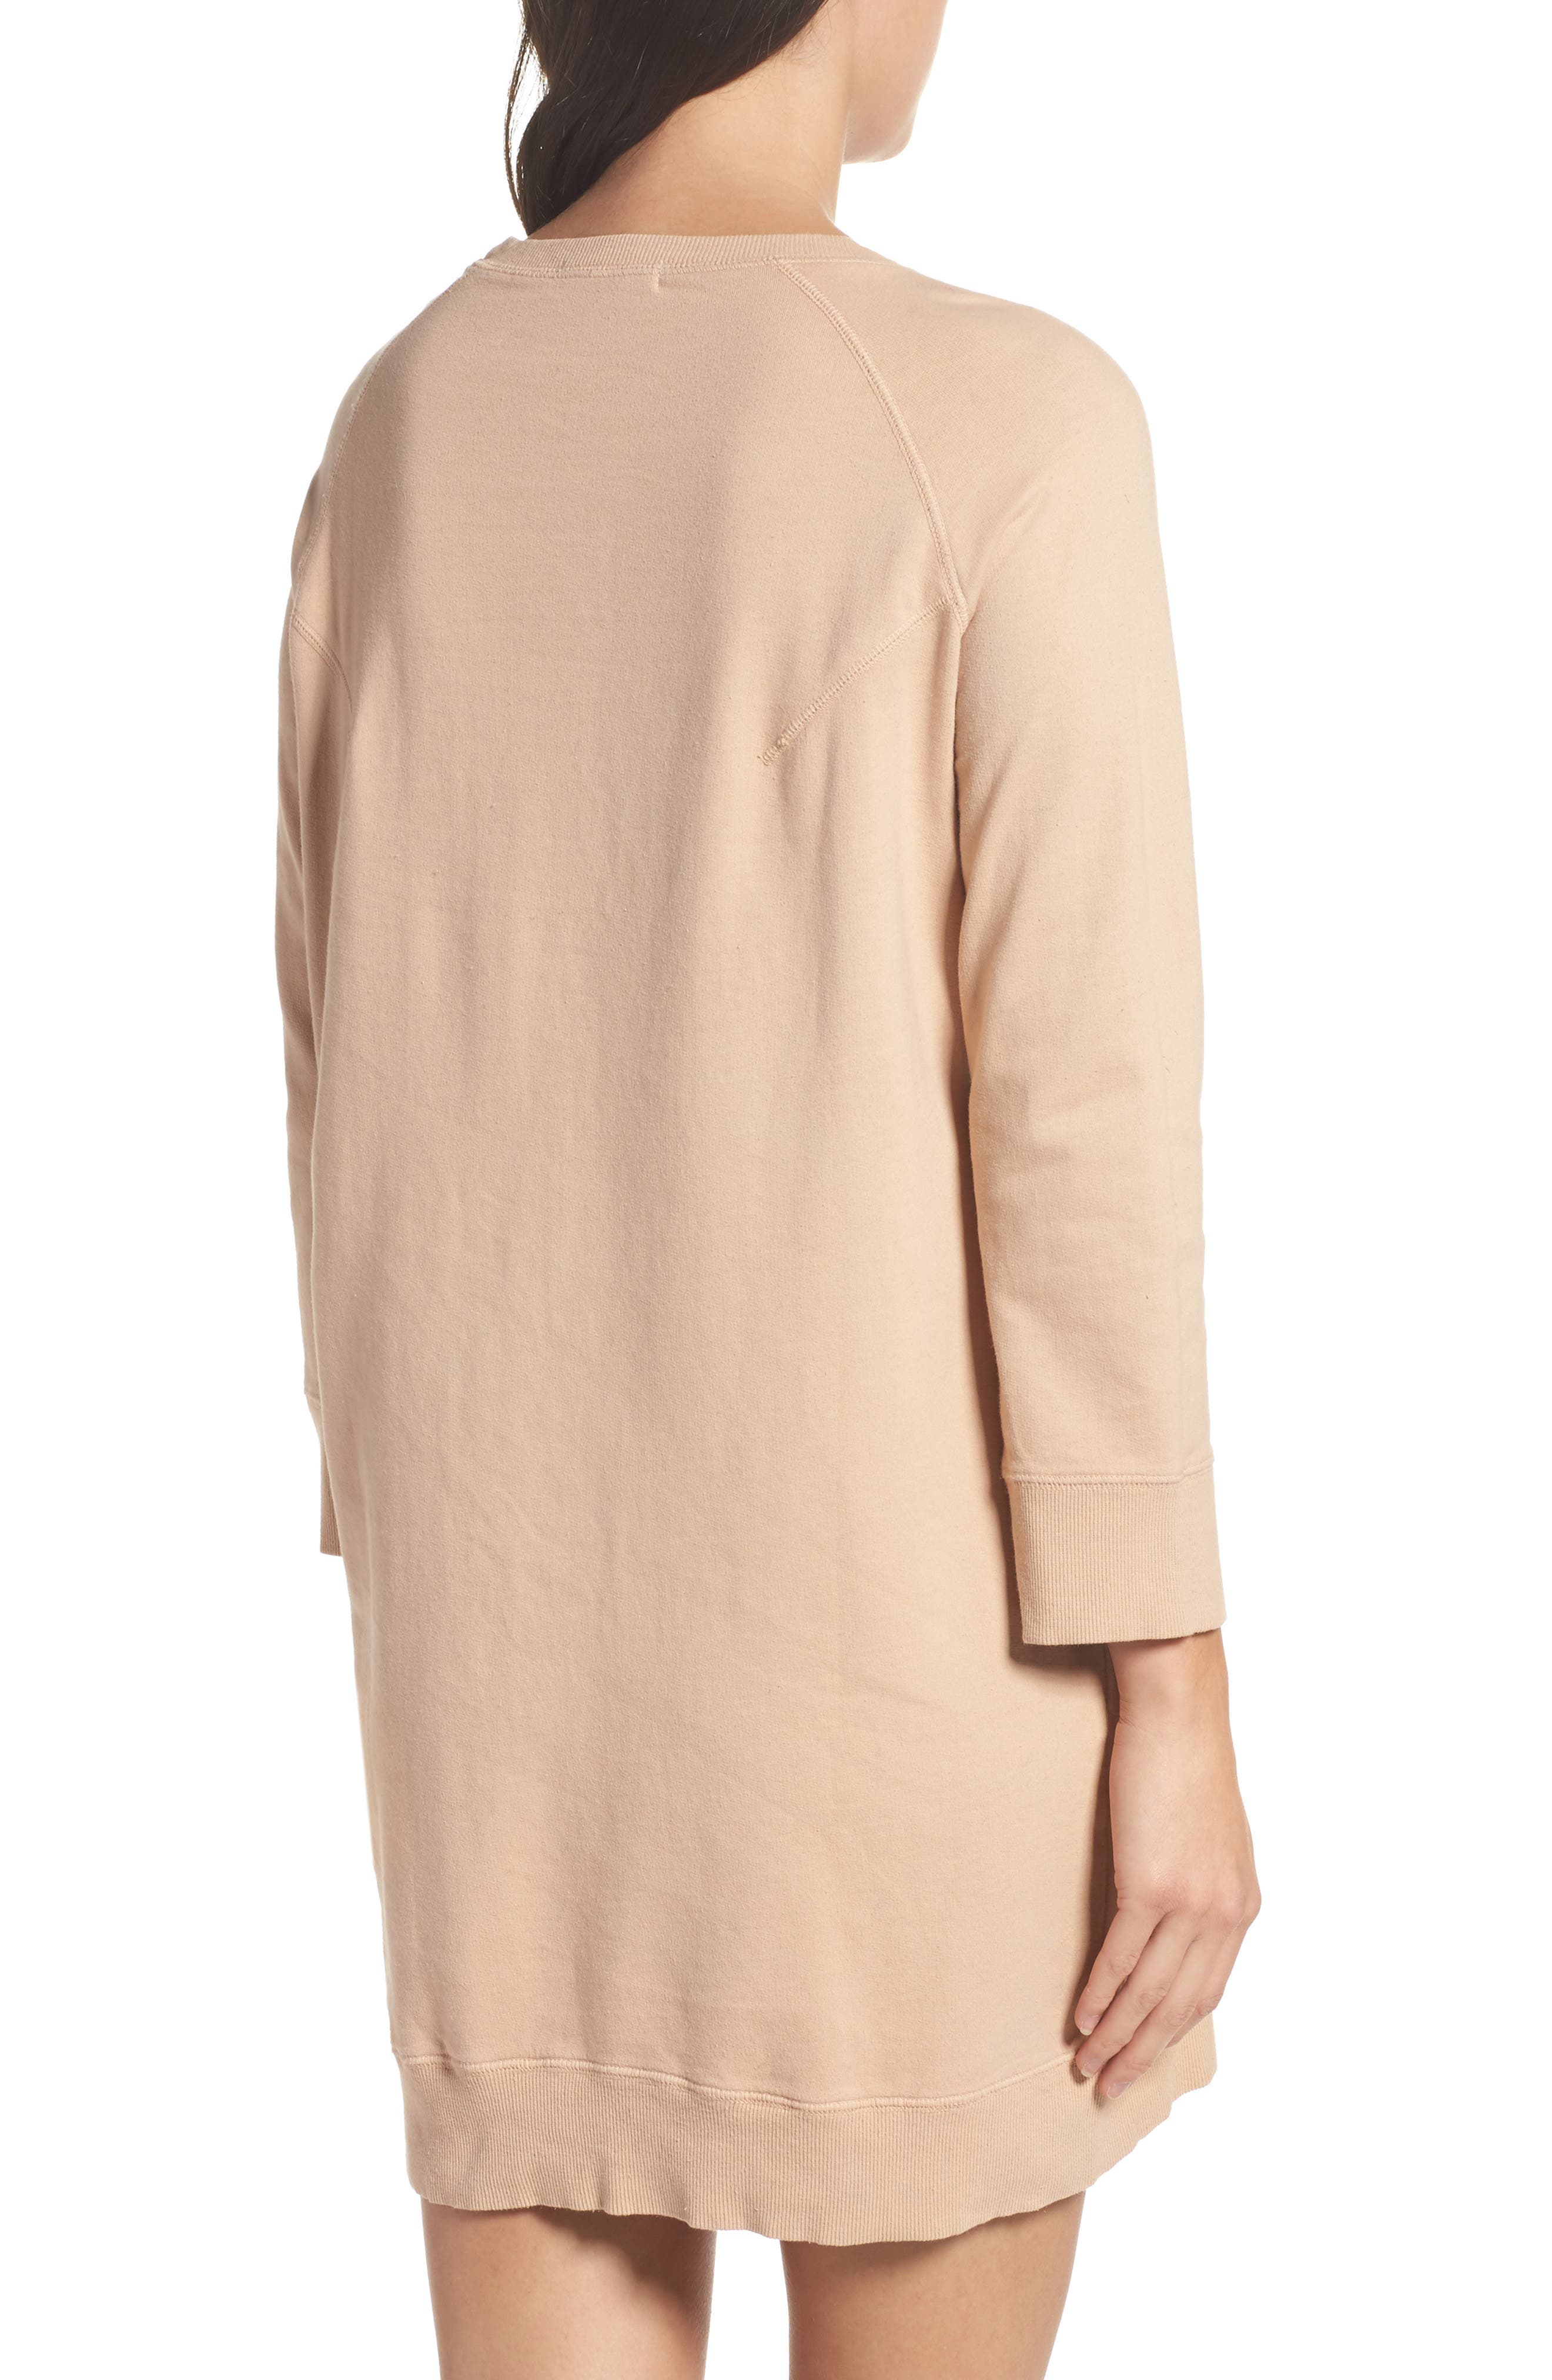 Sweatshirt Dress,                             Alternate thumbnail 2, color,                             Nude